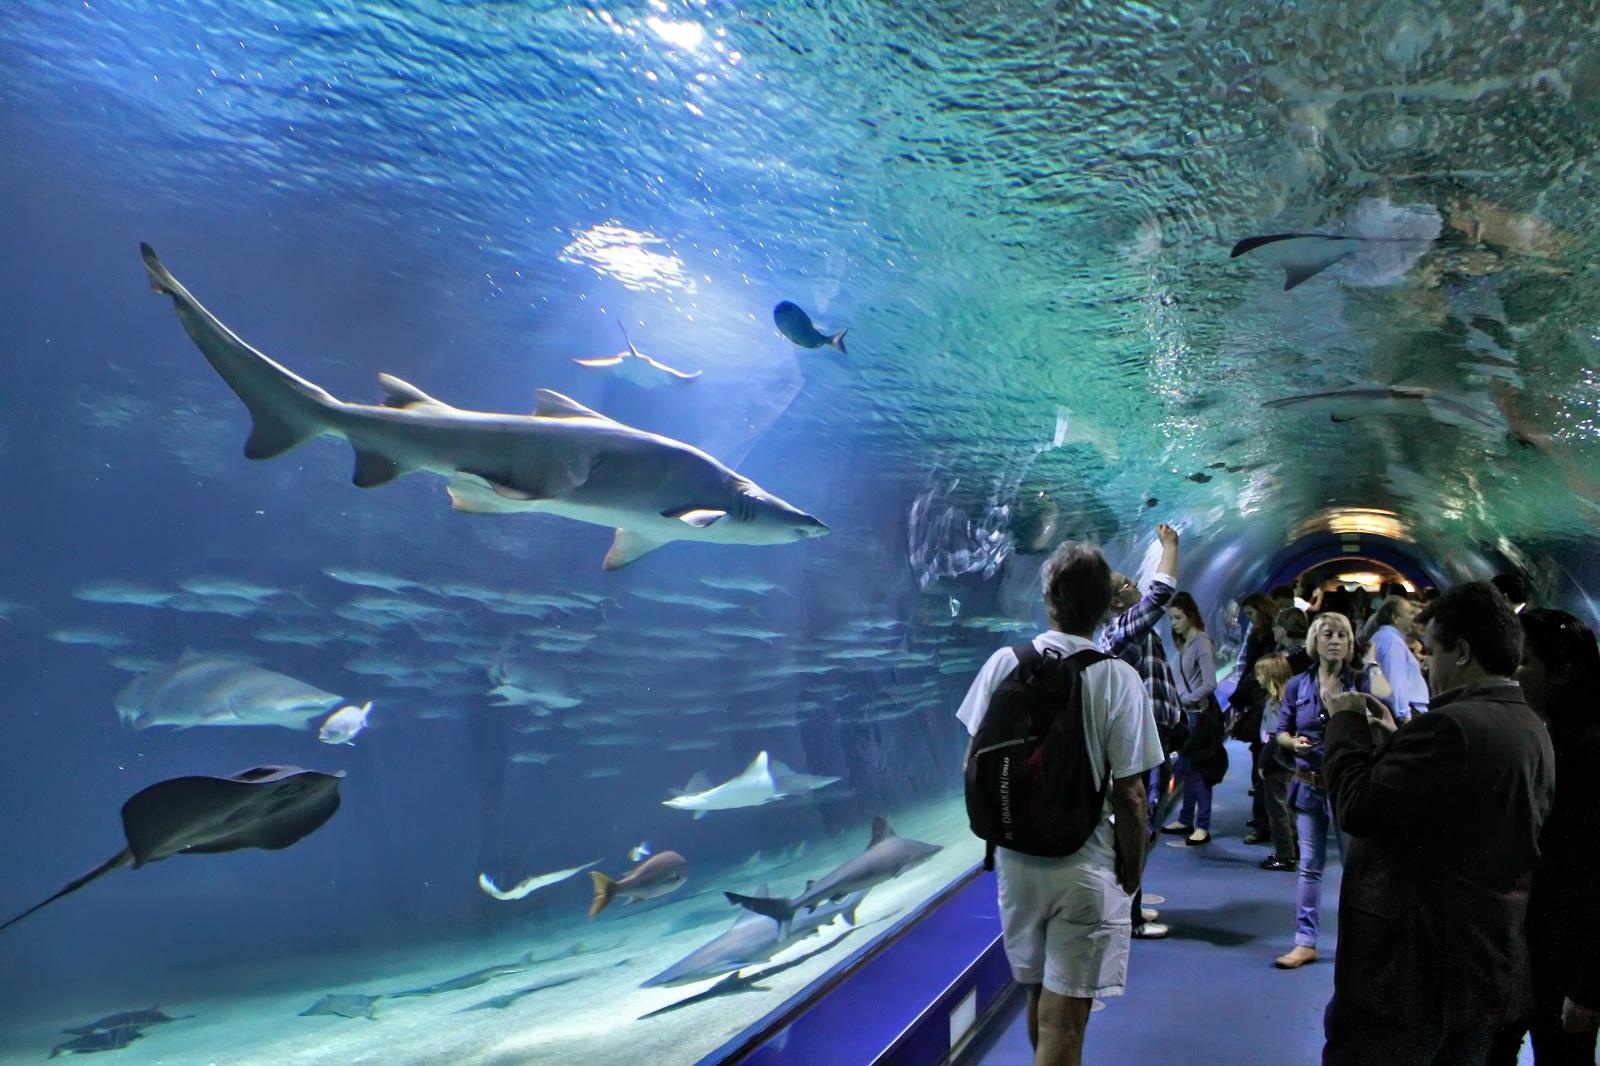 اقیانوس شناسی والنسیا